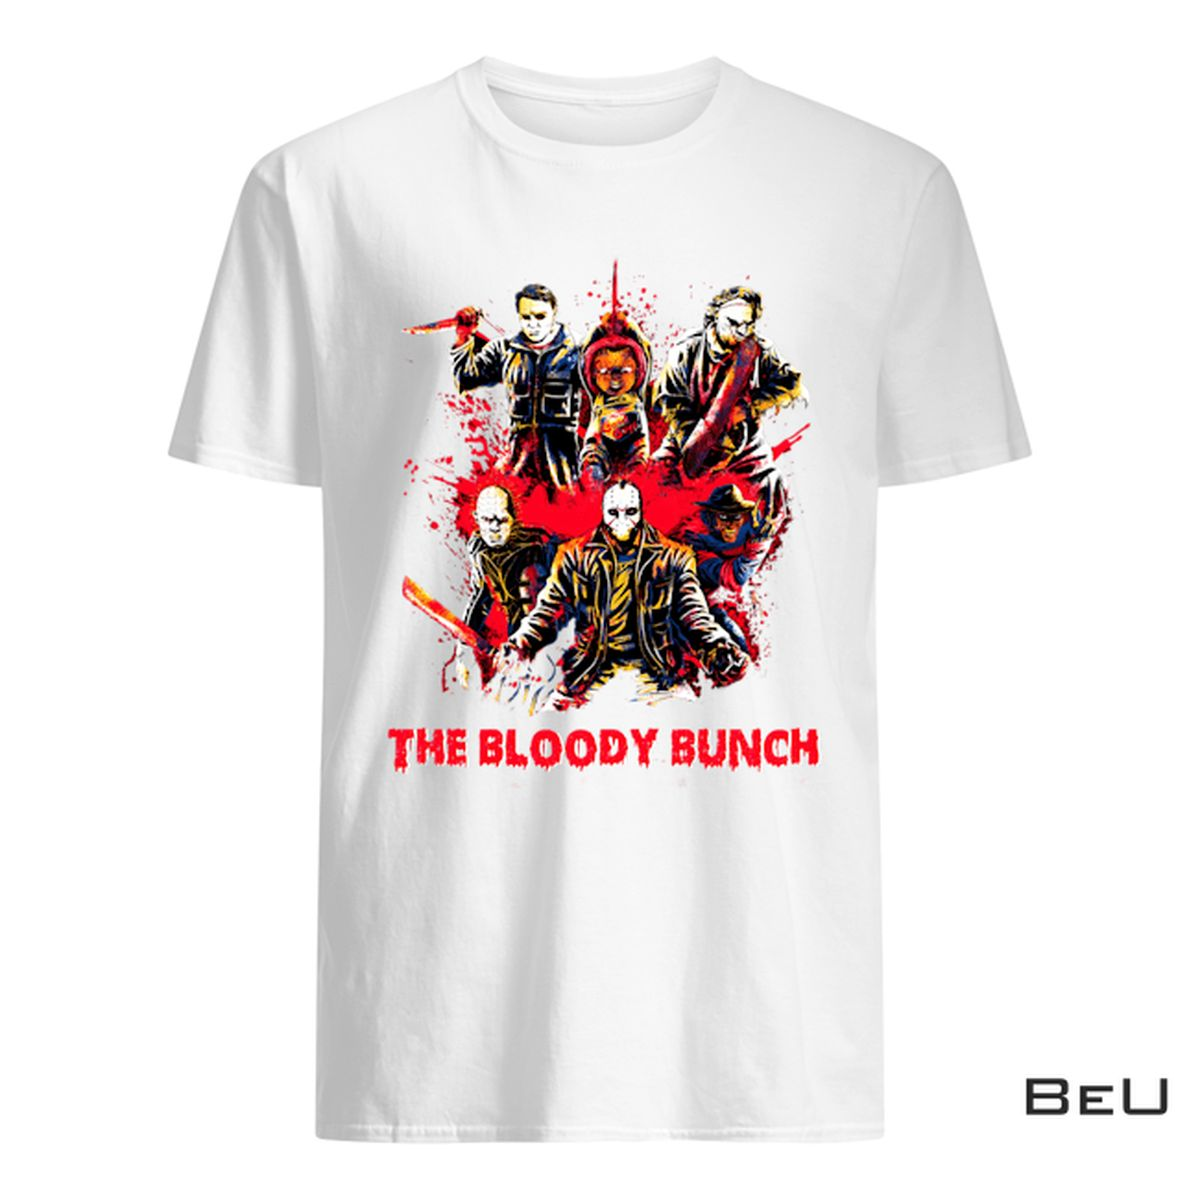 The Bloody Bunch Shirt